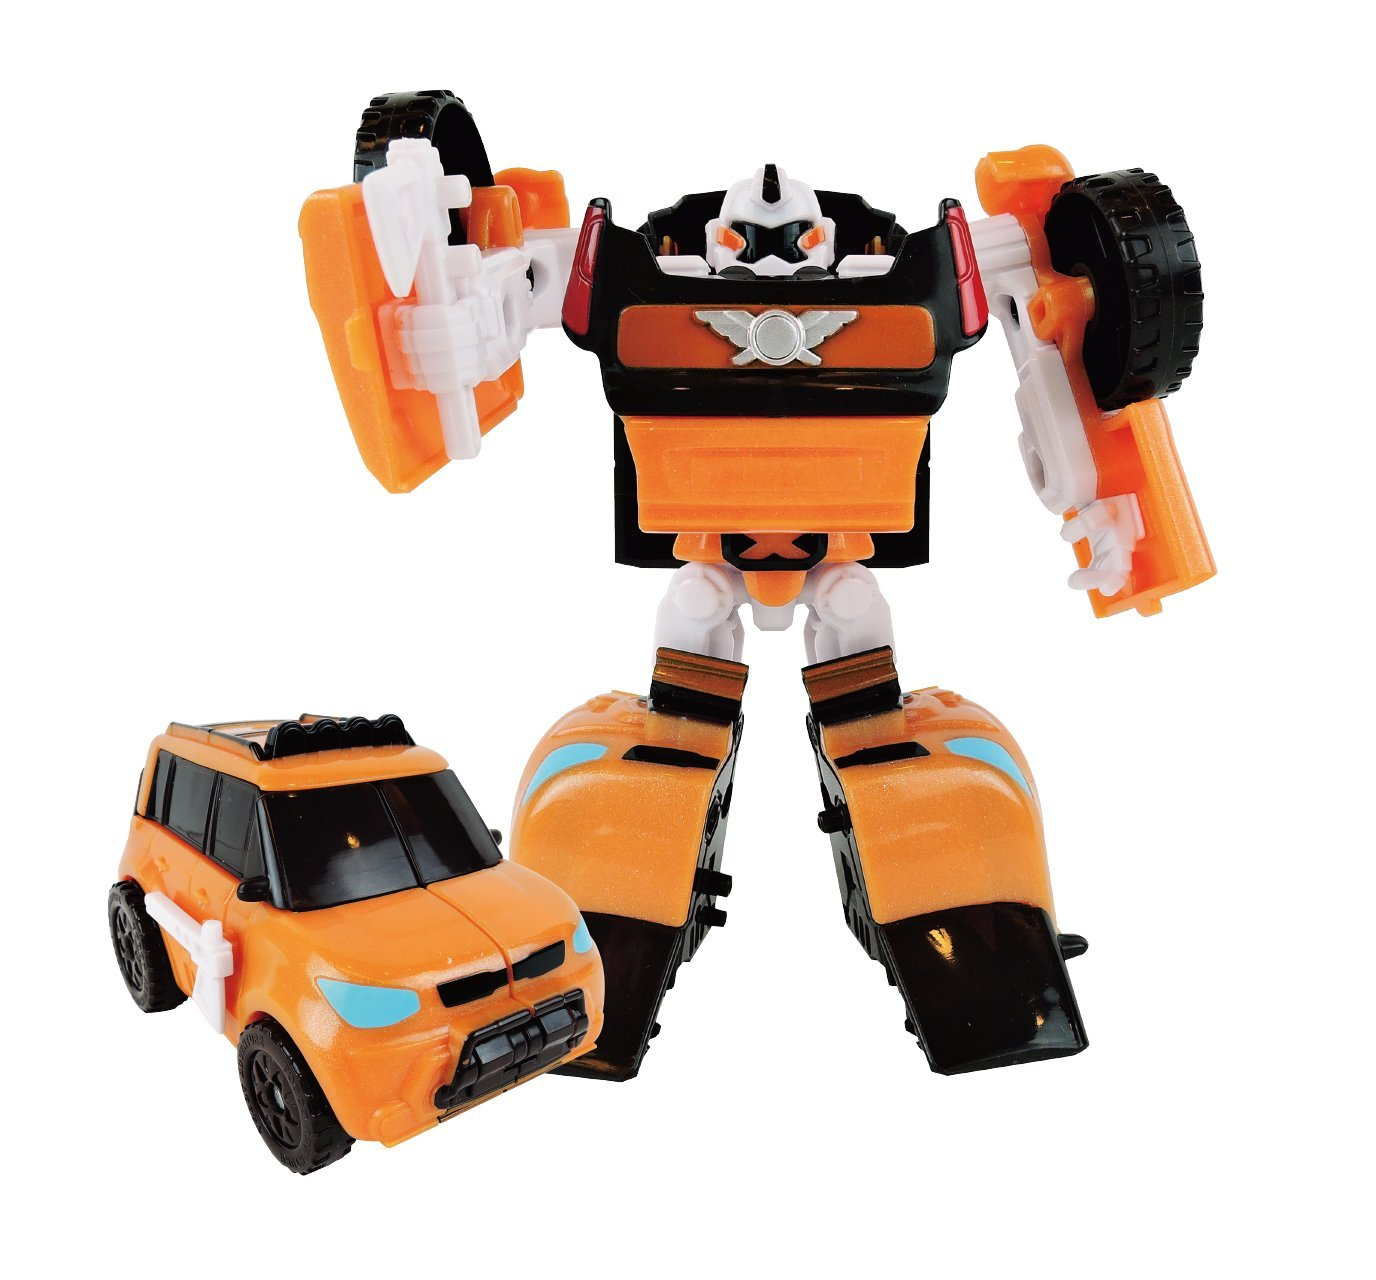 Tobot Adventure Mini X Transformer Robot Car Toy Action Figure